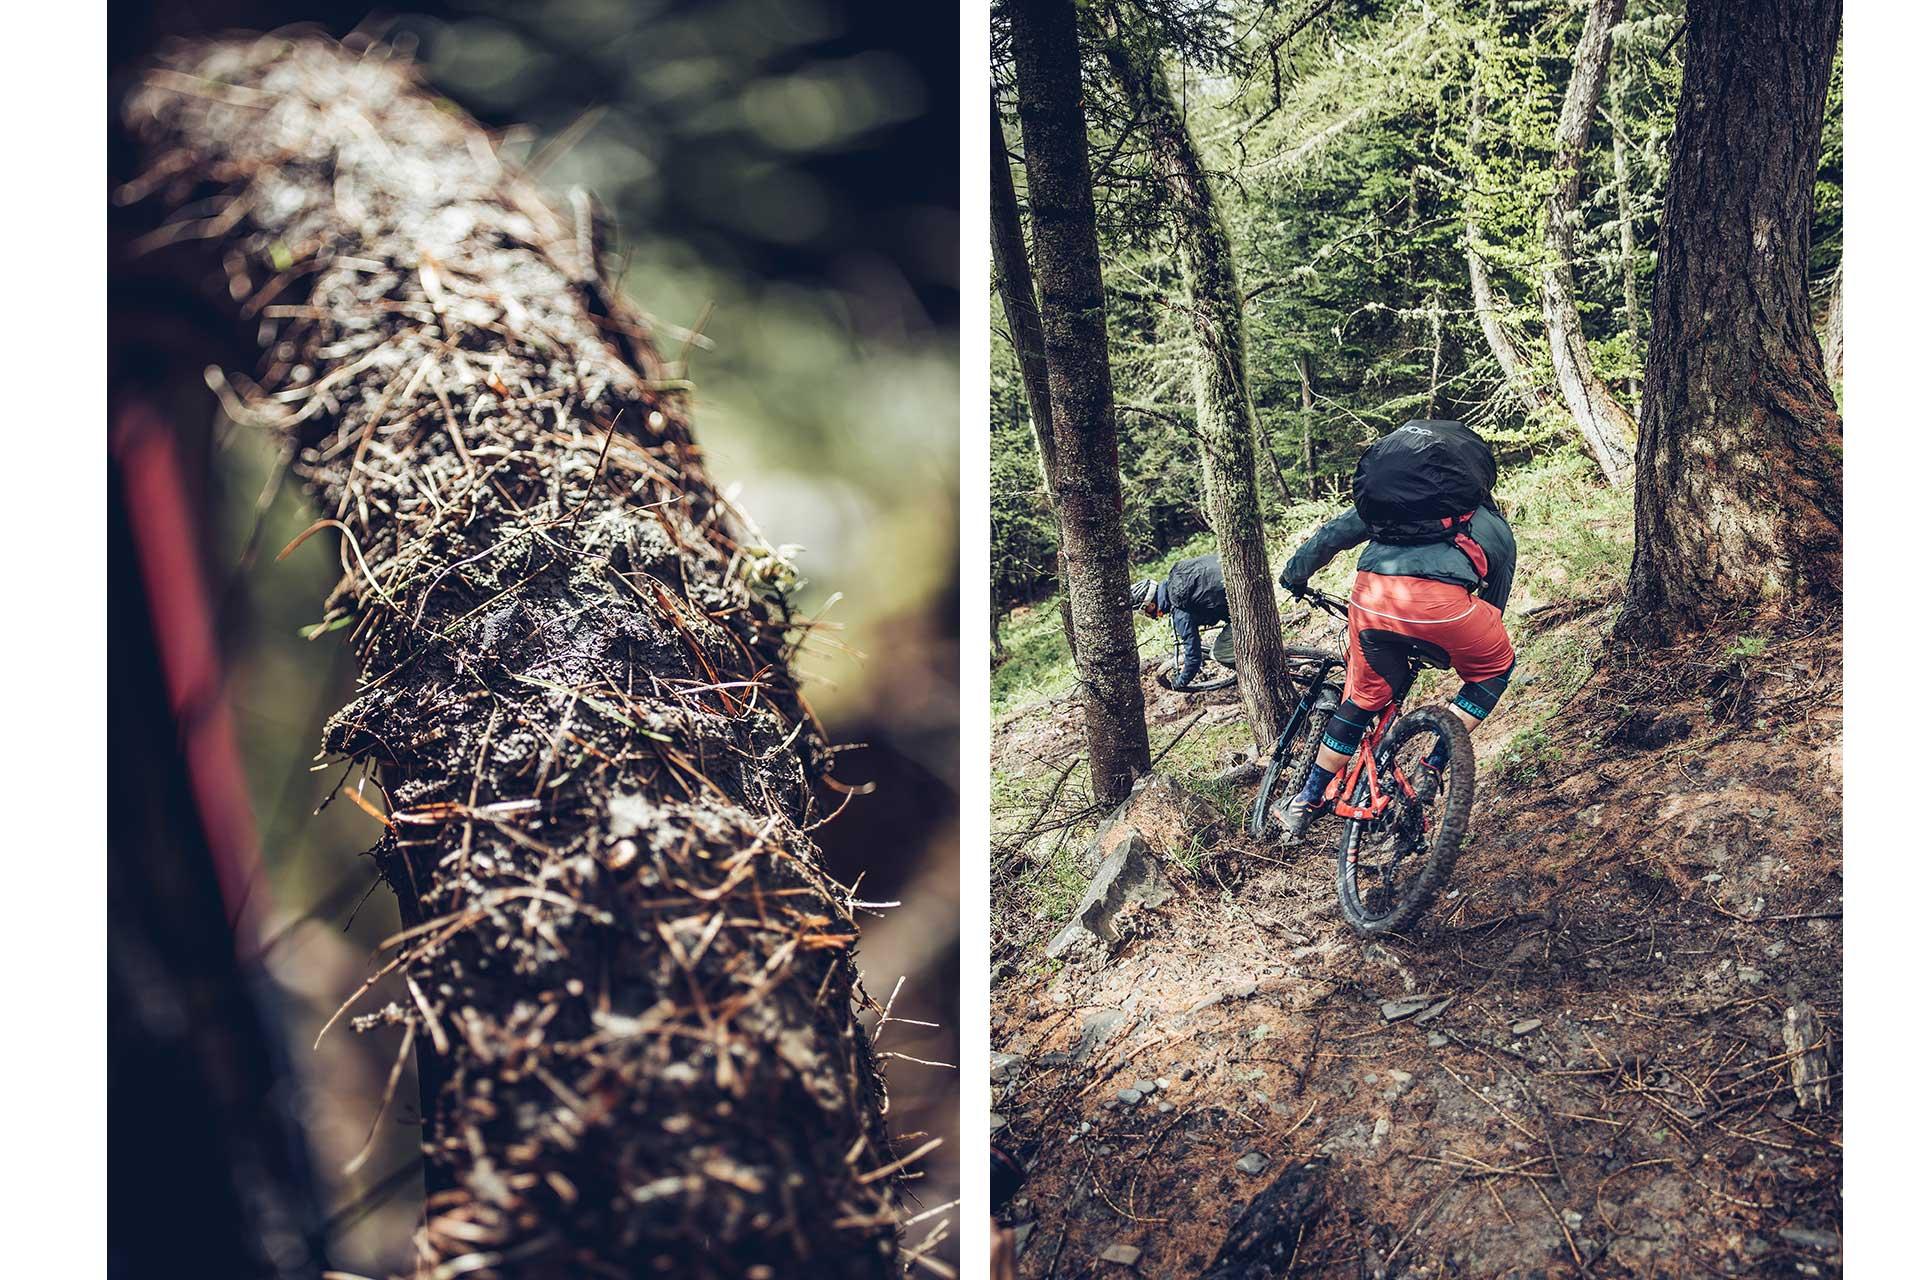 Mountainbike Fotograf Sport Outdoor Tour Berge Downhill Freeride Singeltrack Salzburg